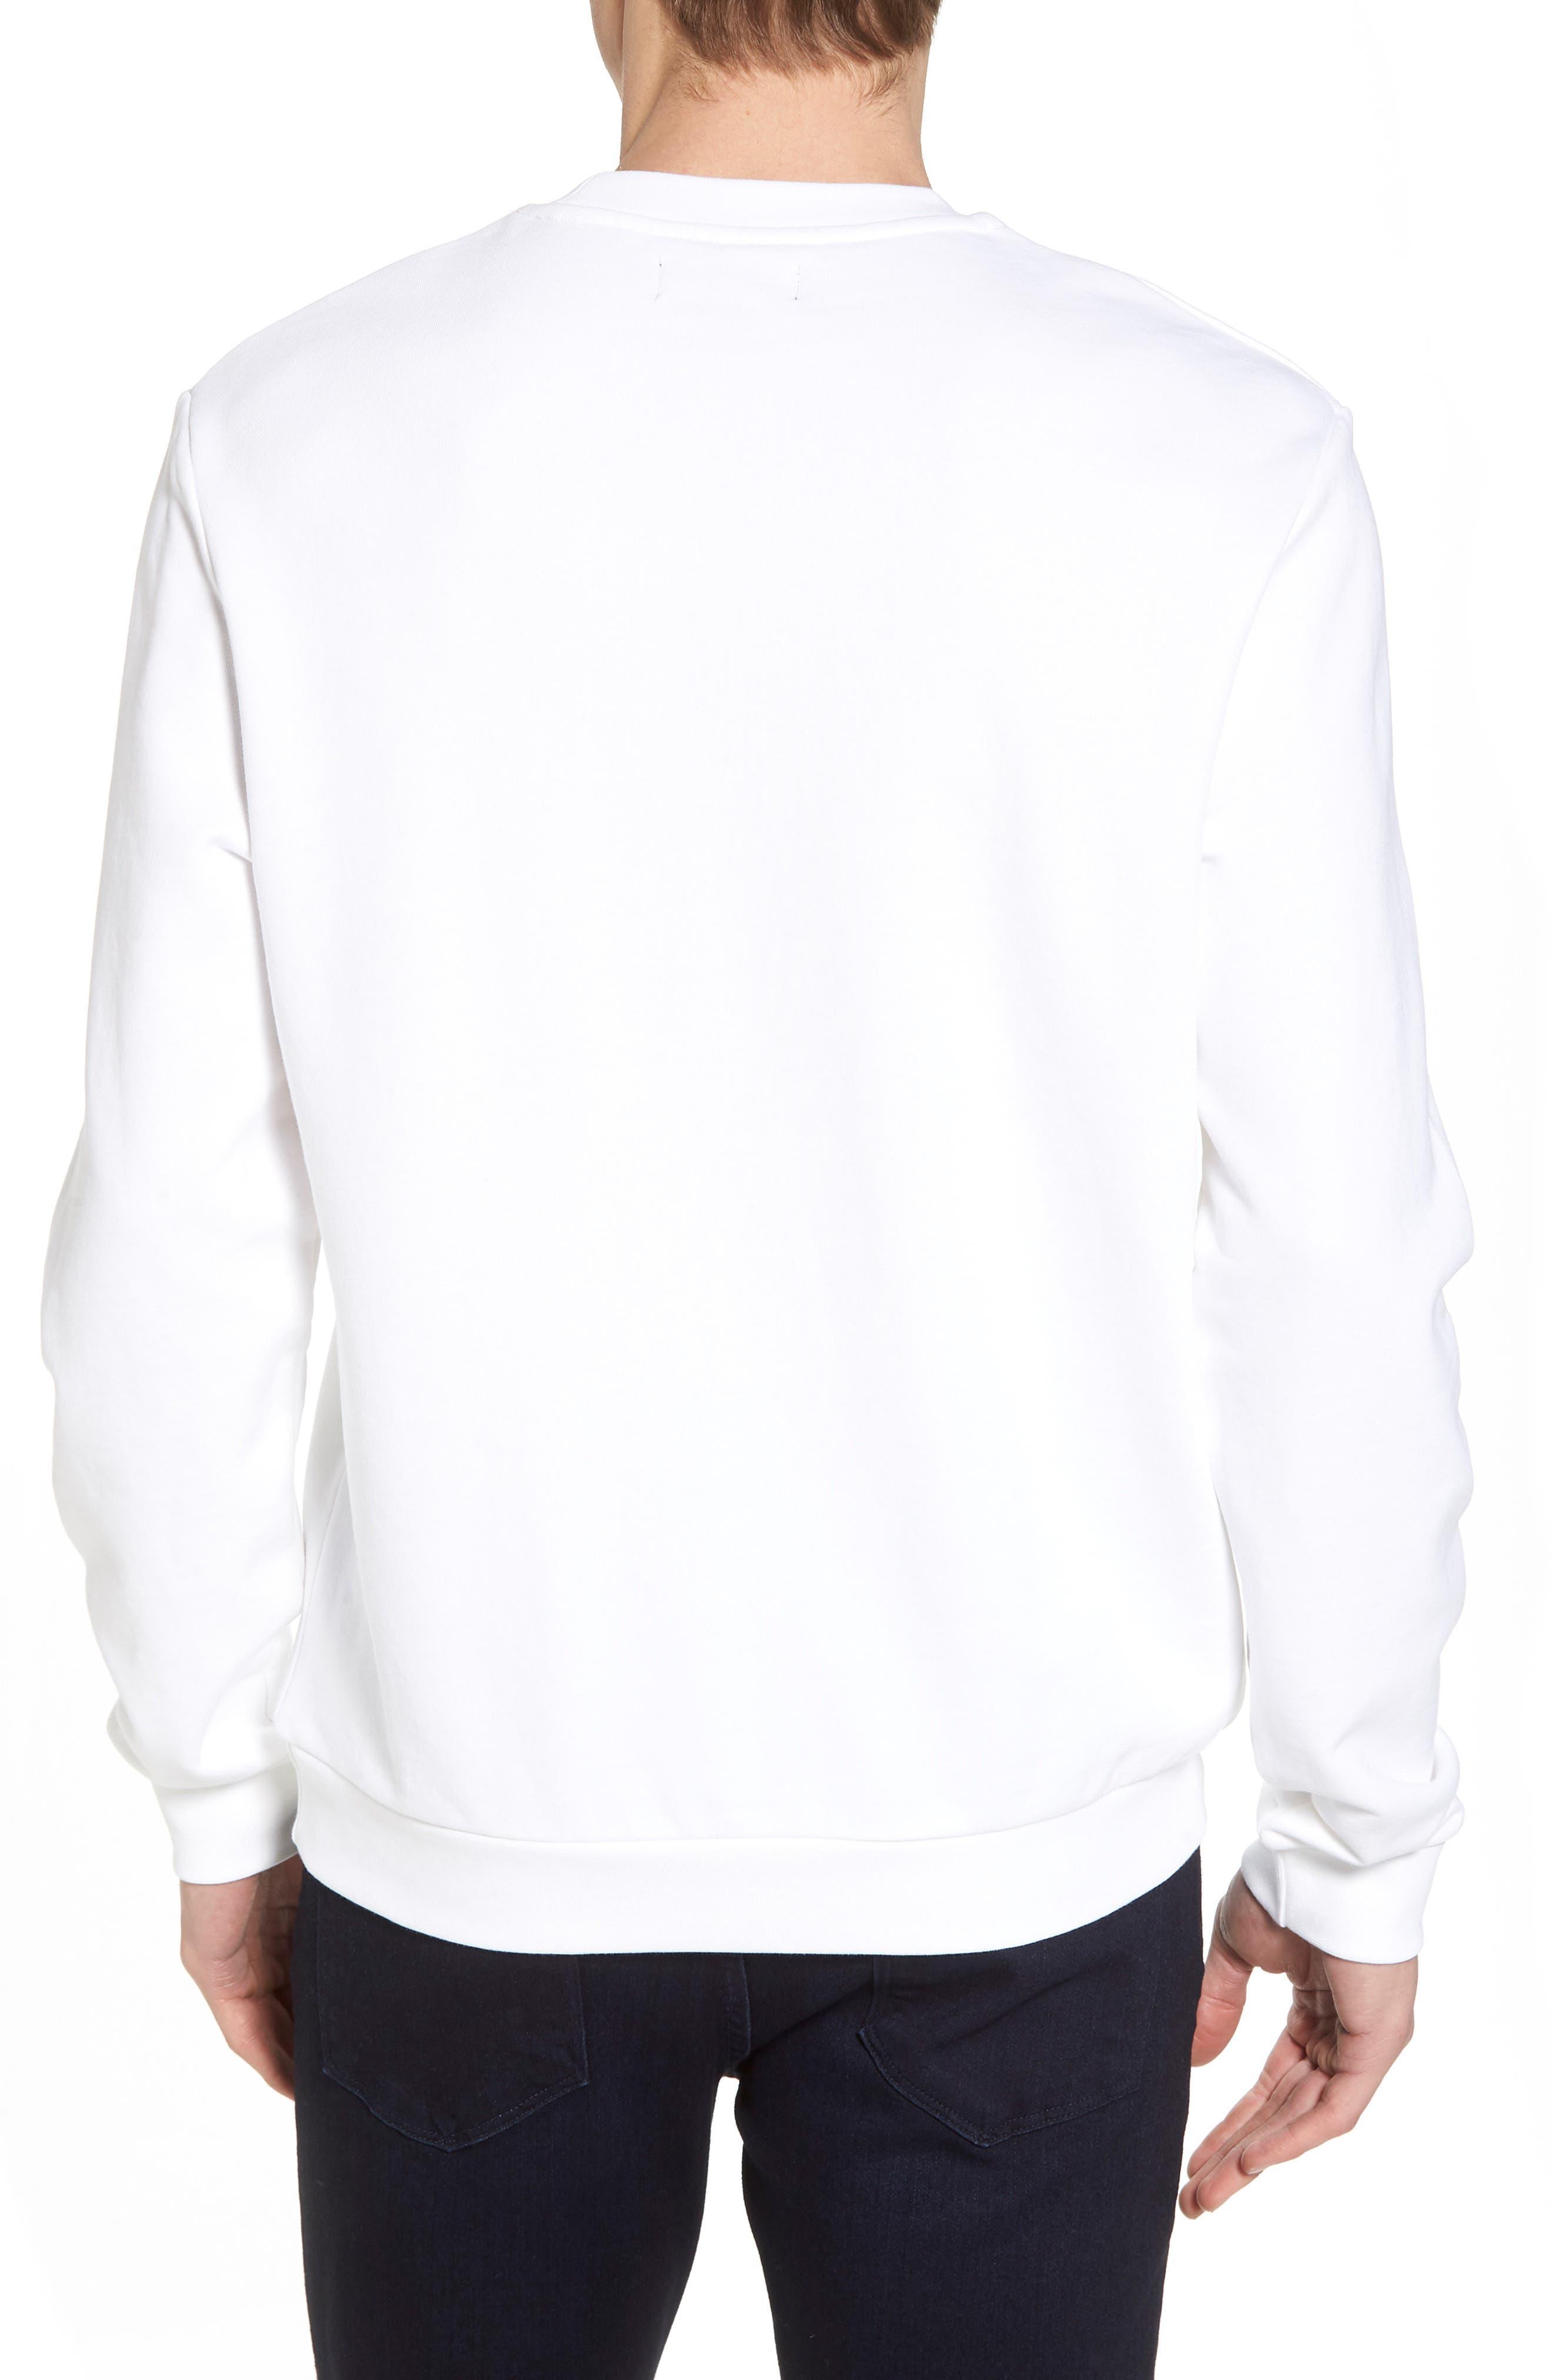 Tennis Sweatshirt,                             Alternate thumbnail 2, color,                             White